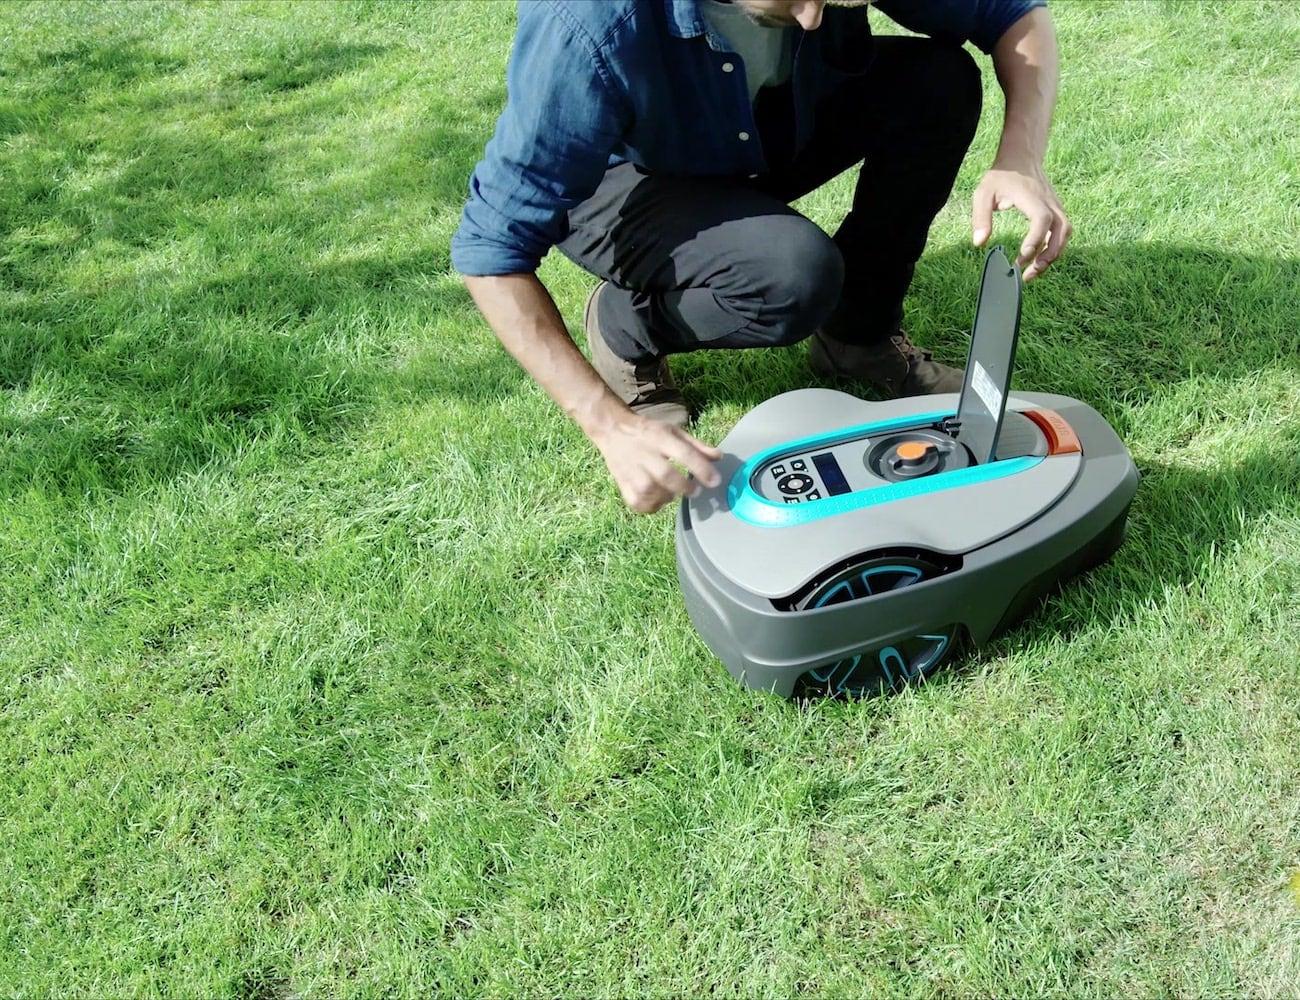 GARDENA Smart SILENO City Robotic Lawnmower Set runs nearly silently